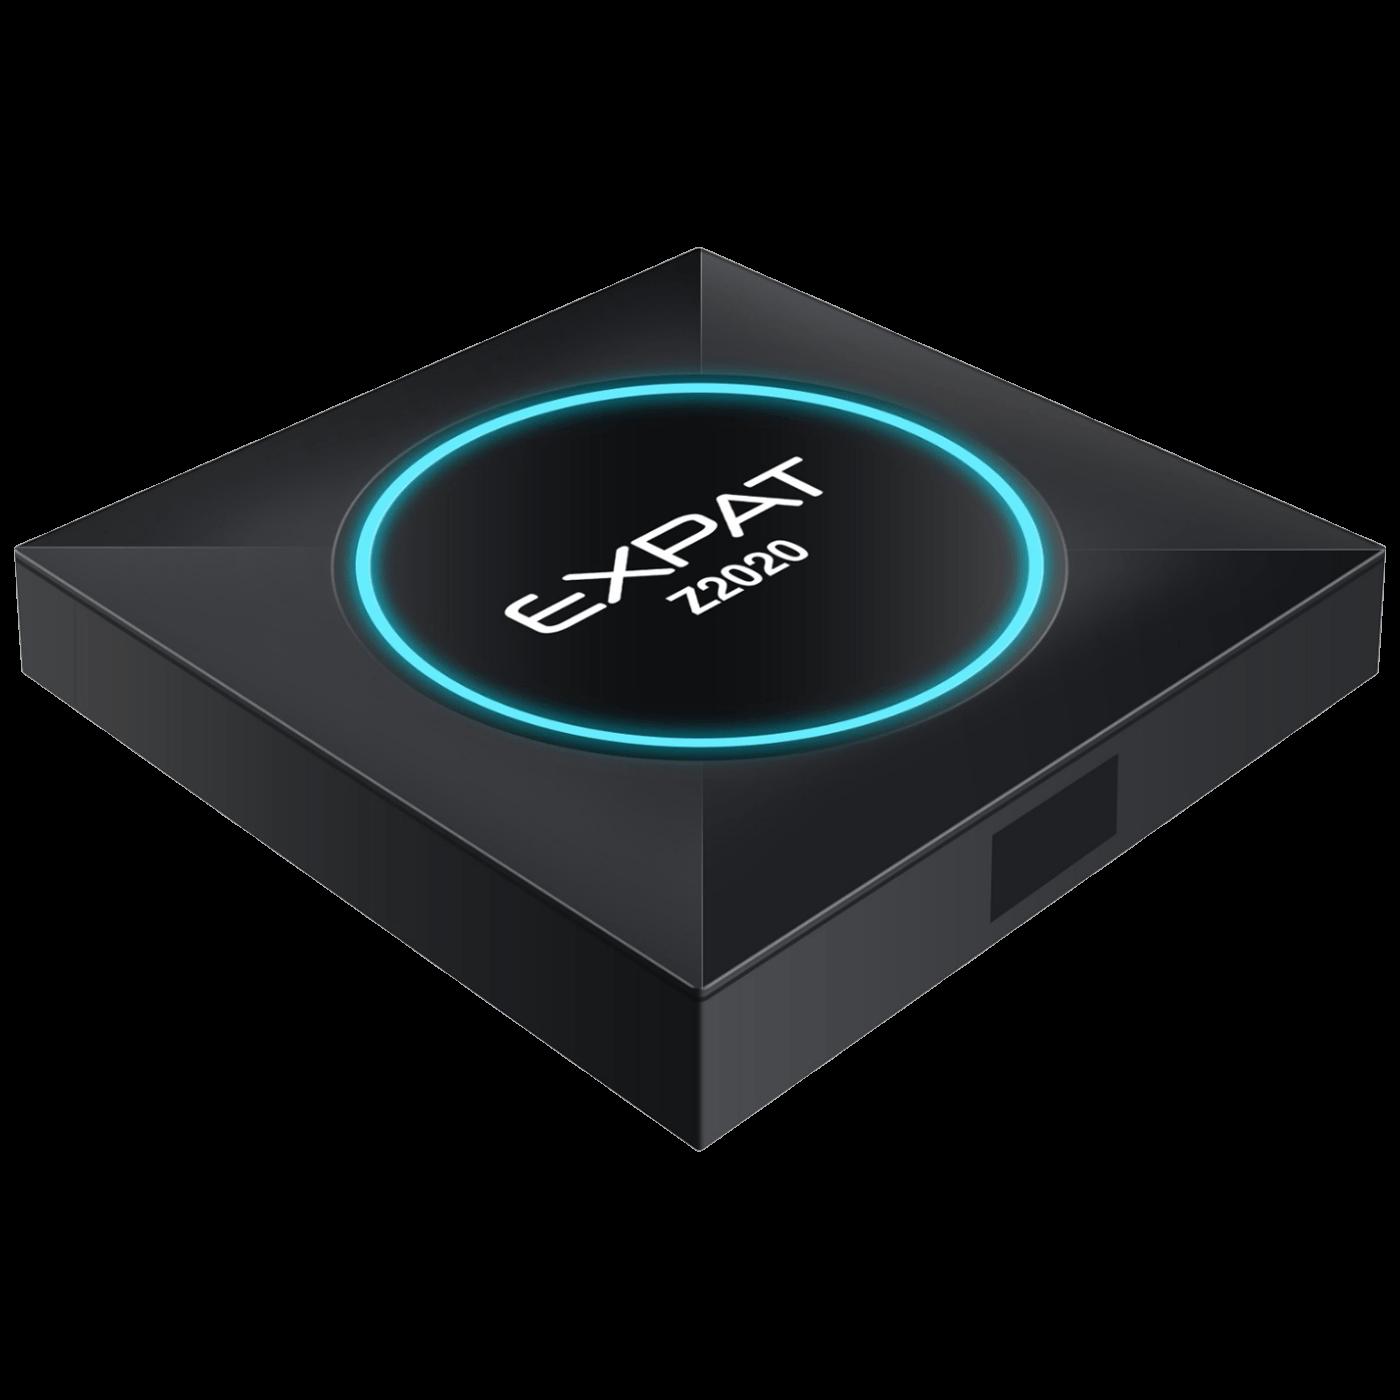 Prijemnik IPTV@Android, UltraHD 4K, 2 /16 GB, WiFi